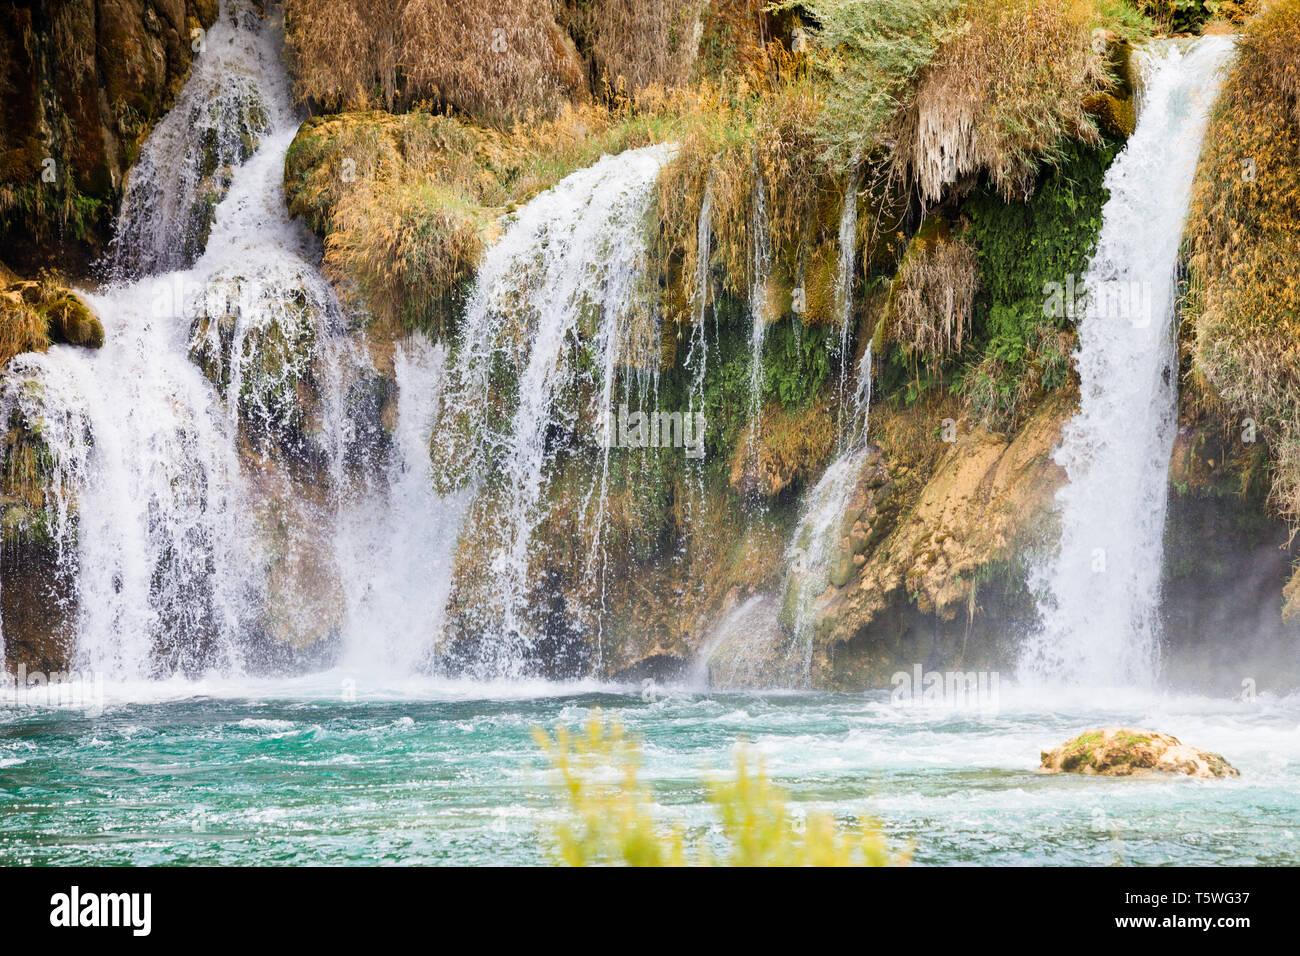 Krka, Sibenik, Kroatien, Europa - Watrefall Gischt Spritzen in eine Kaskade im Nationalpark Krka Stockfoto